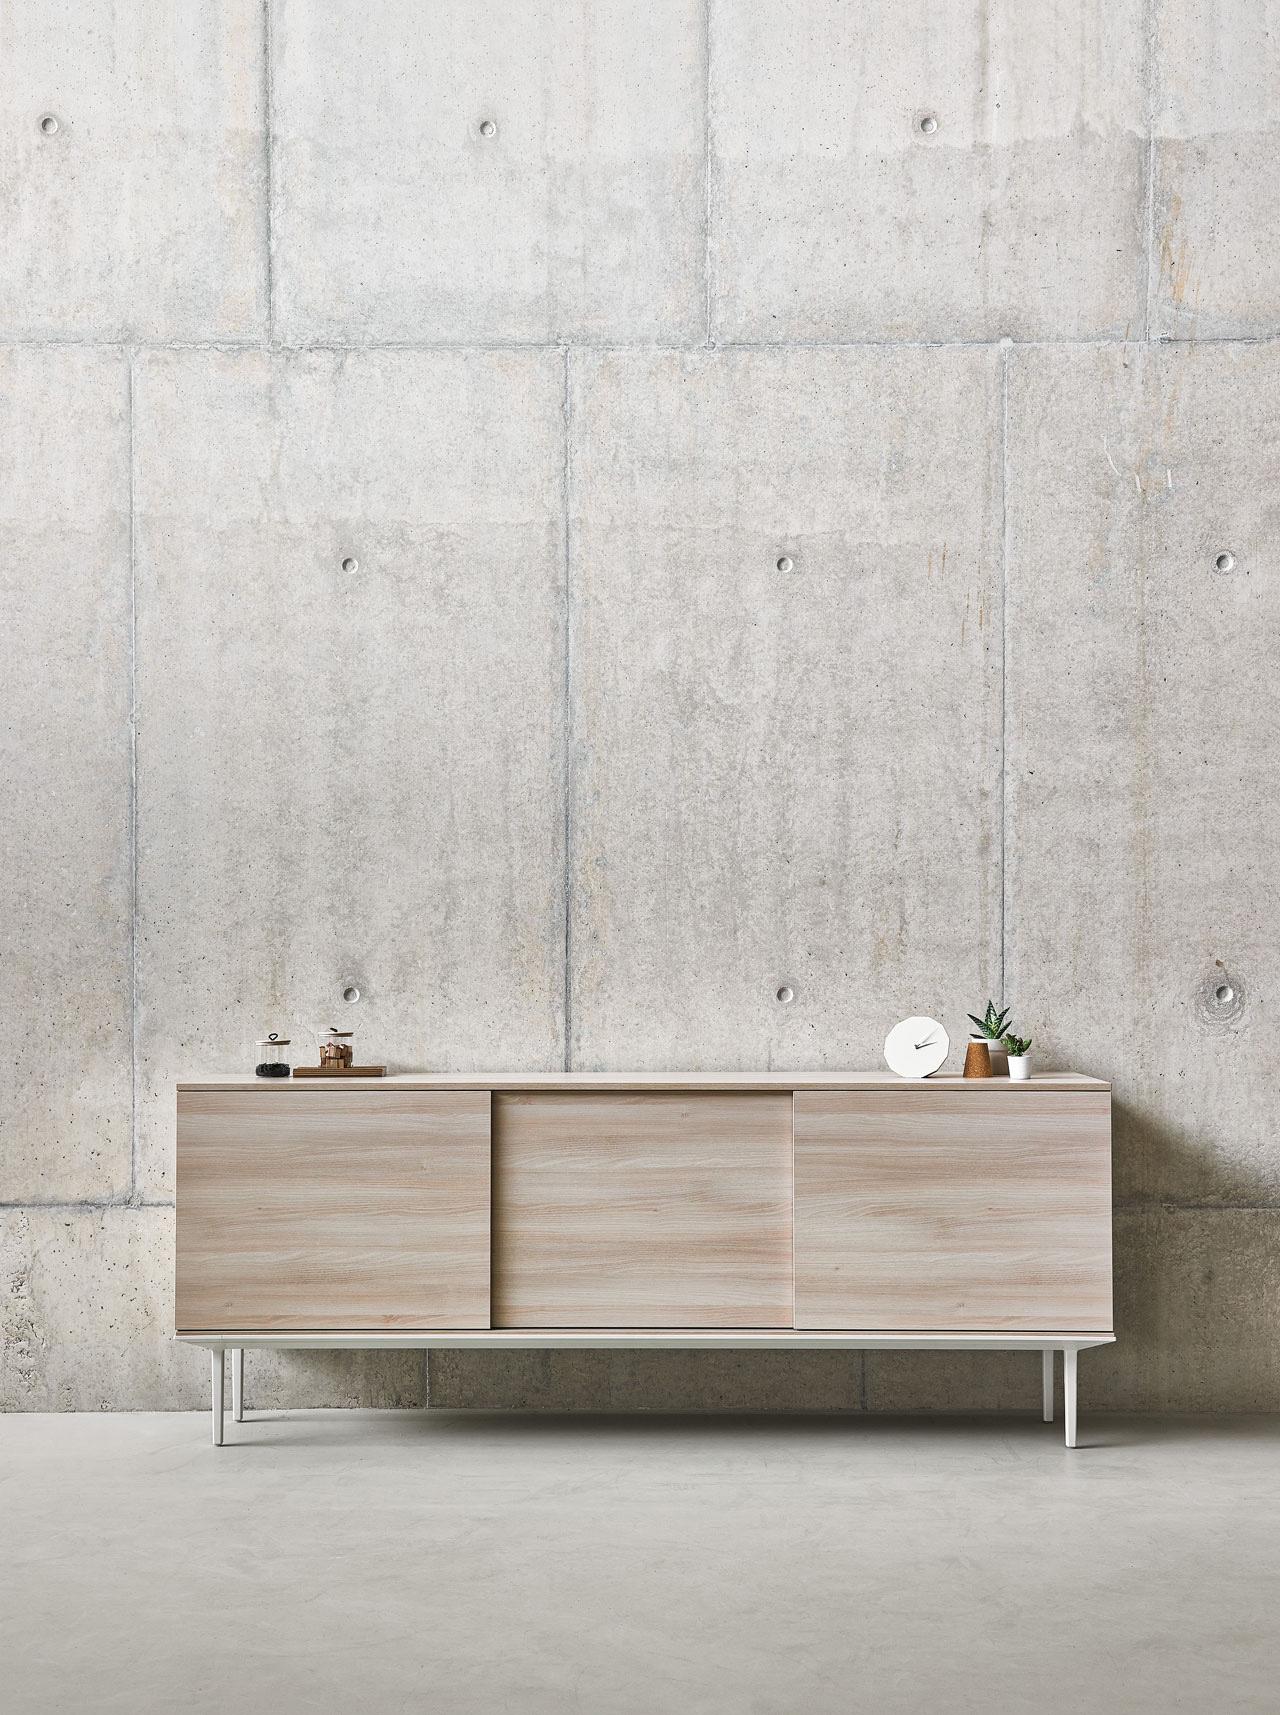 Longo is a contemporary storage solution by designers Ramos & Bassols.